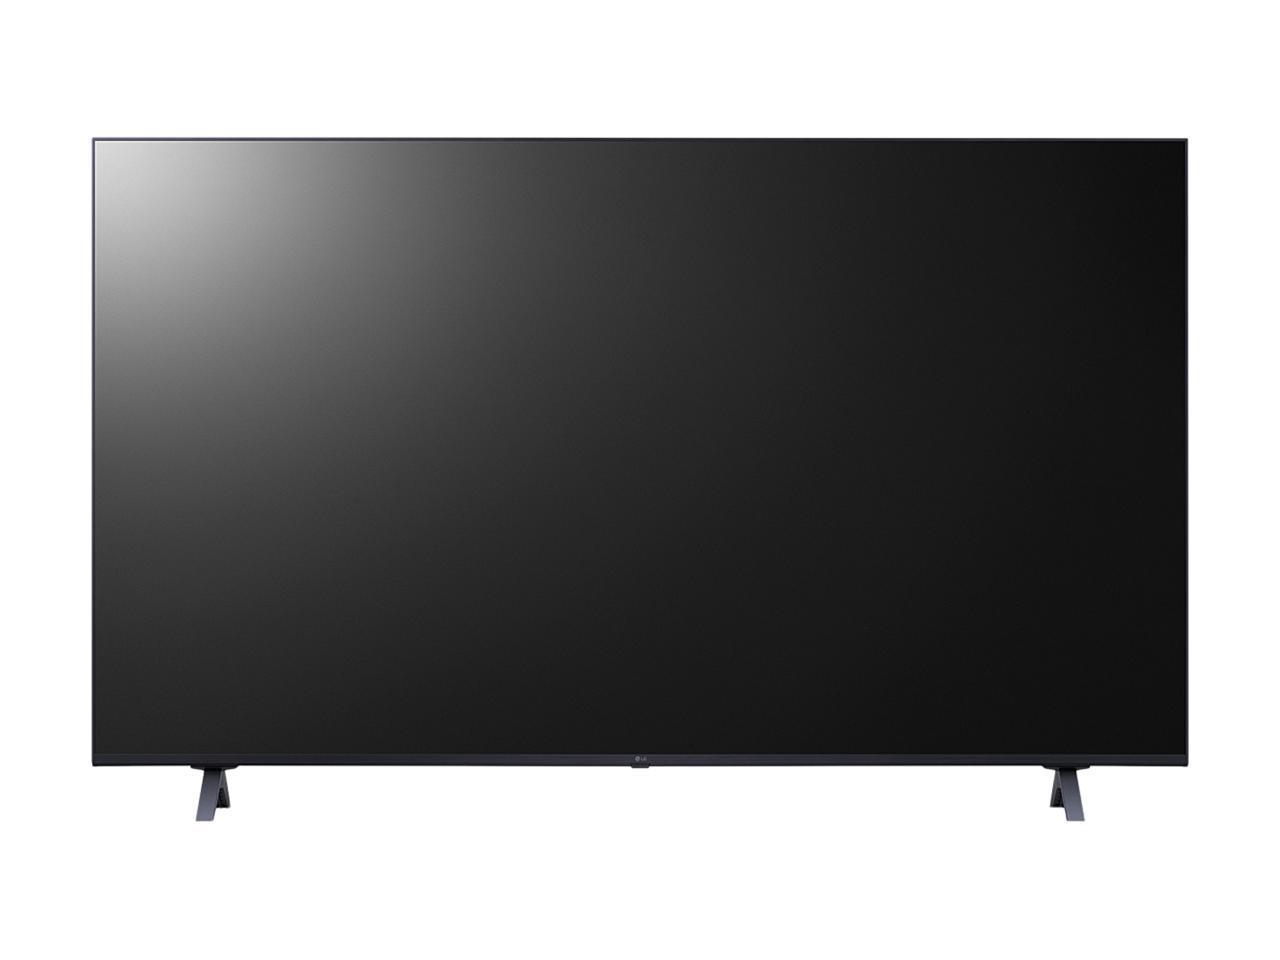 LG 50UP8000PUA 4K Smart UHD TV w/ AI ThinQ (2021) @Newegg $447